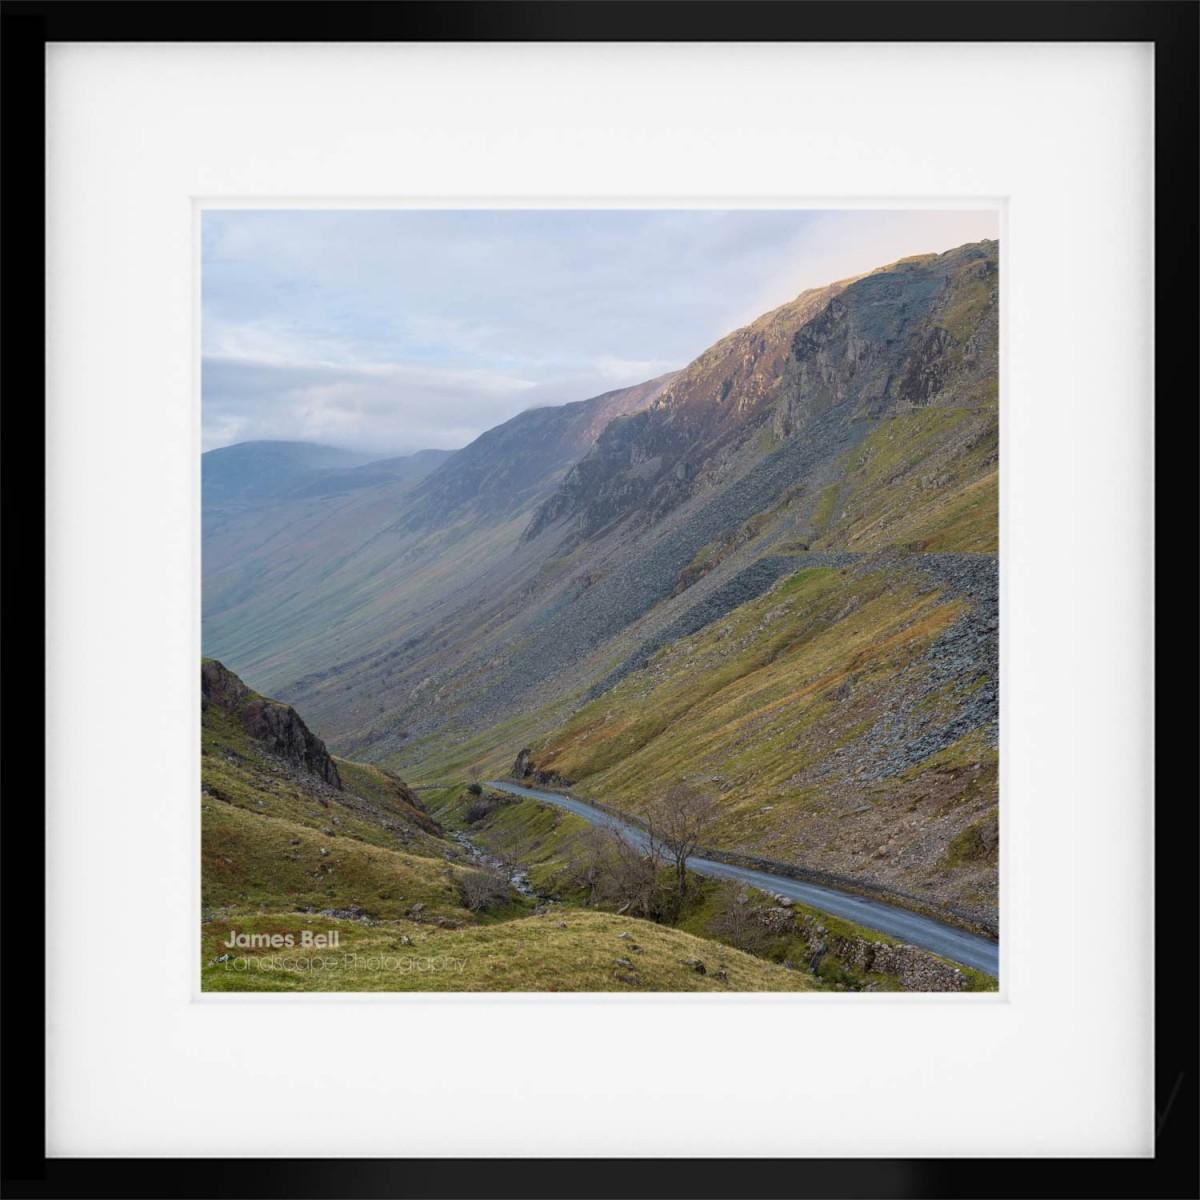 The Honister Pass framed print